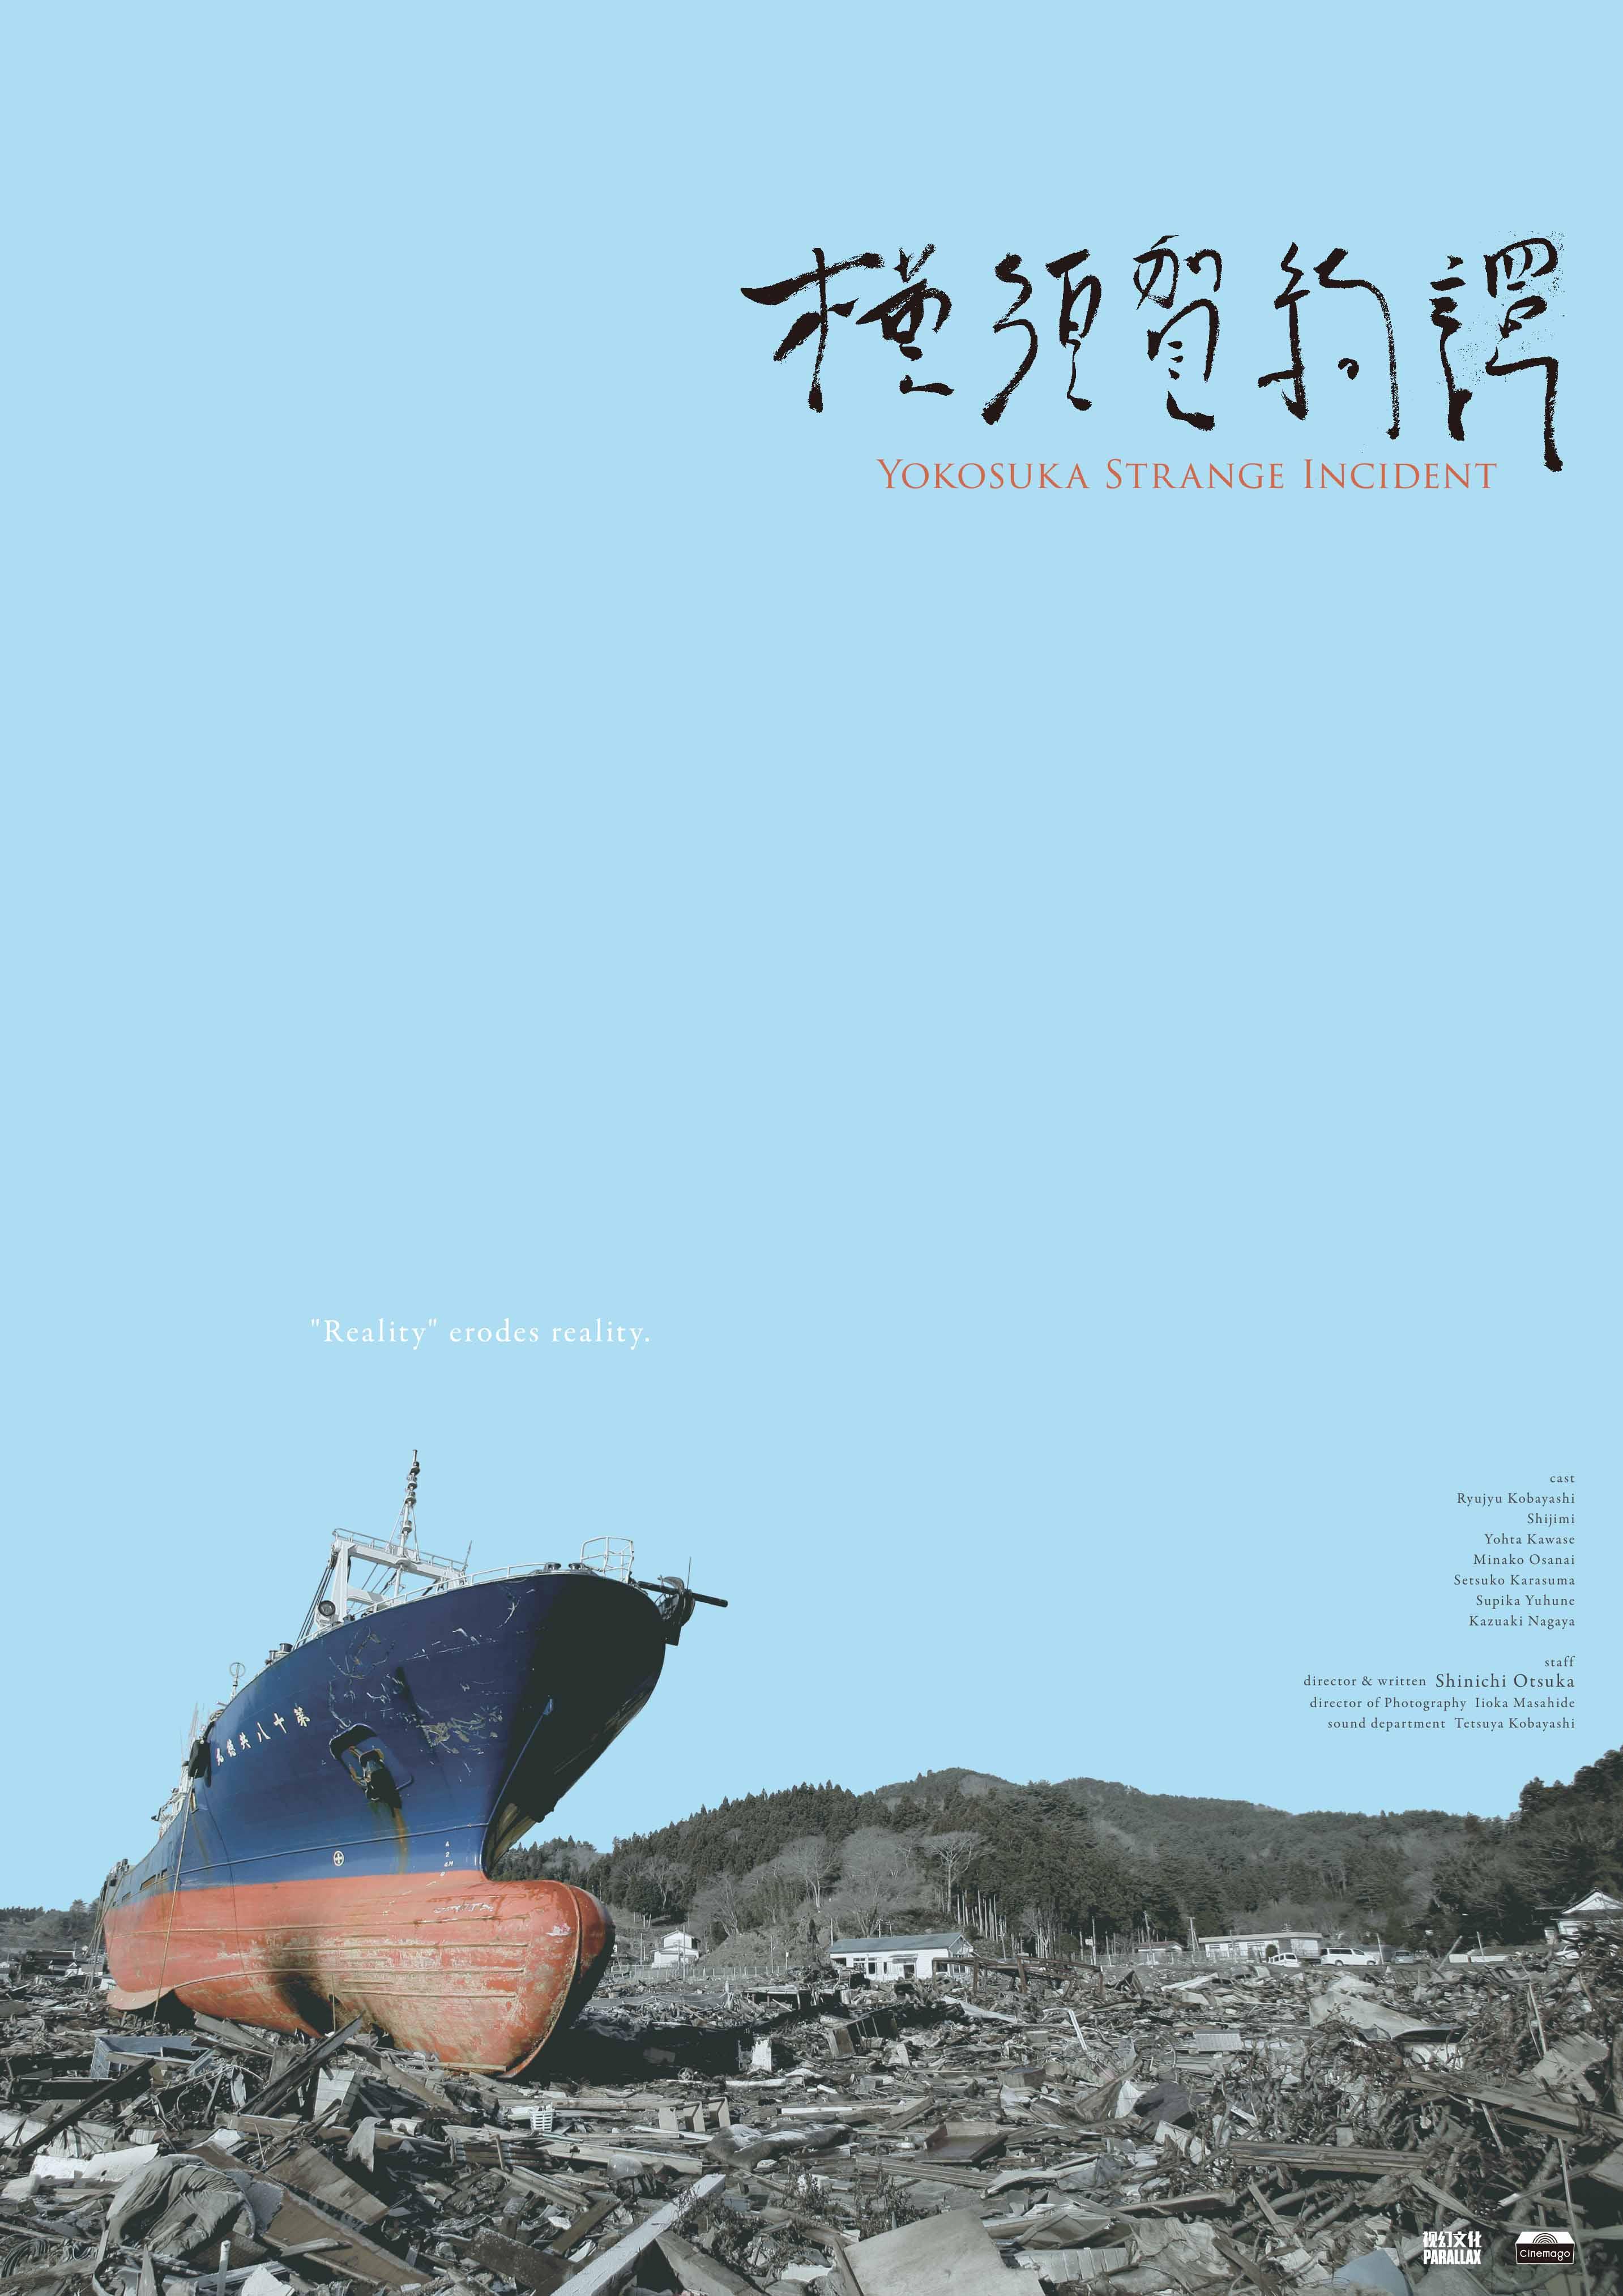 YOKOSUKA STRANGE INCIDENT_0301